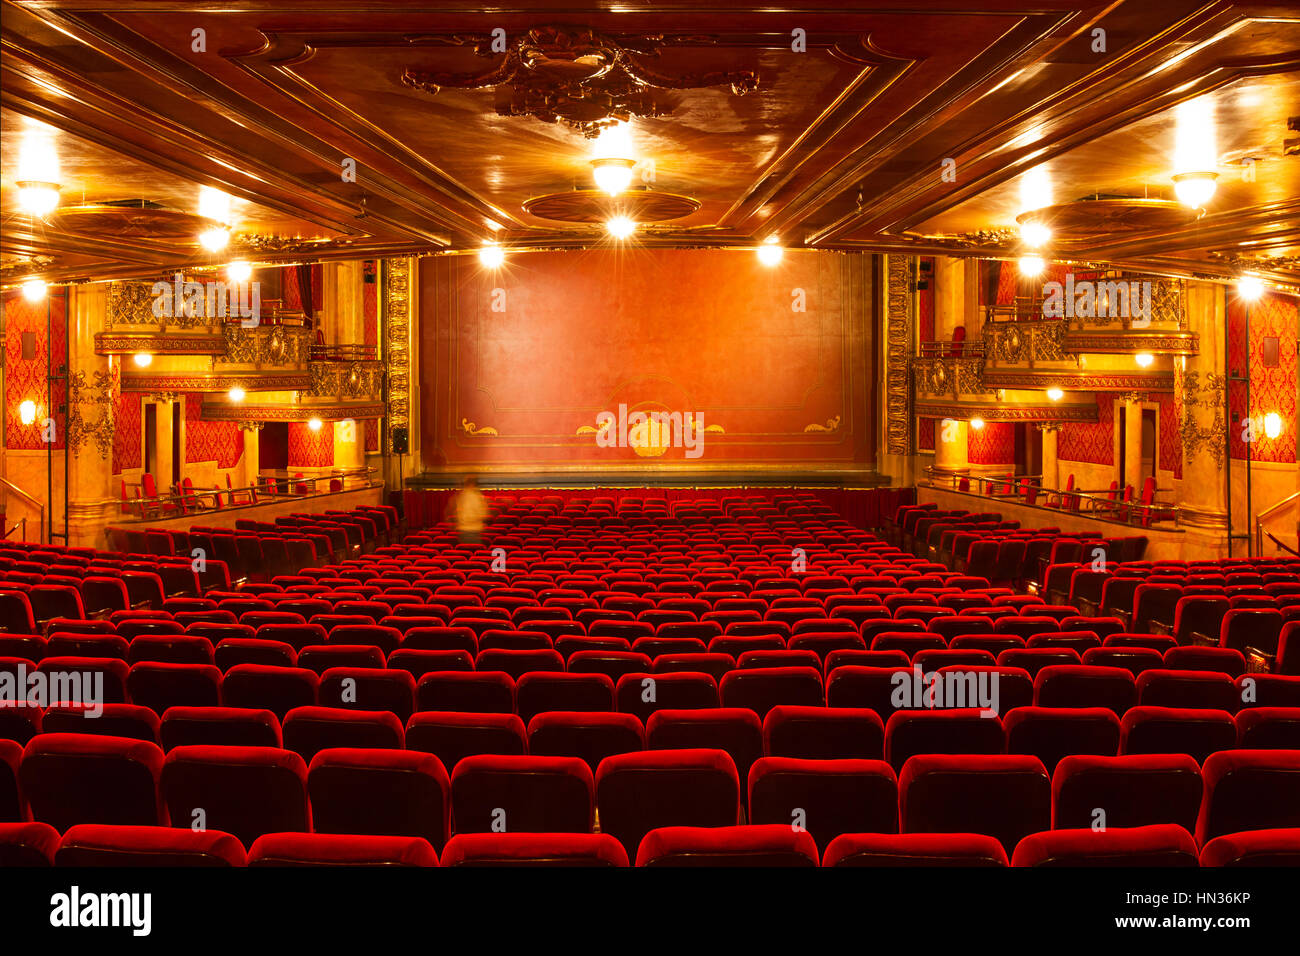 the ornate elgin theatre in the elgin and winter garden theatres